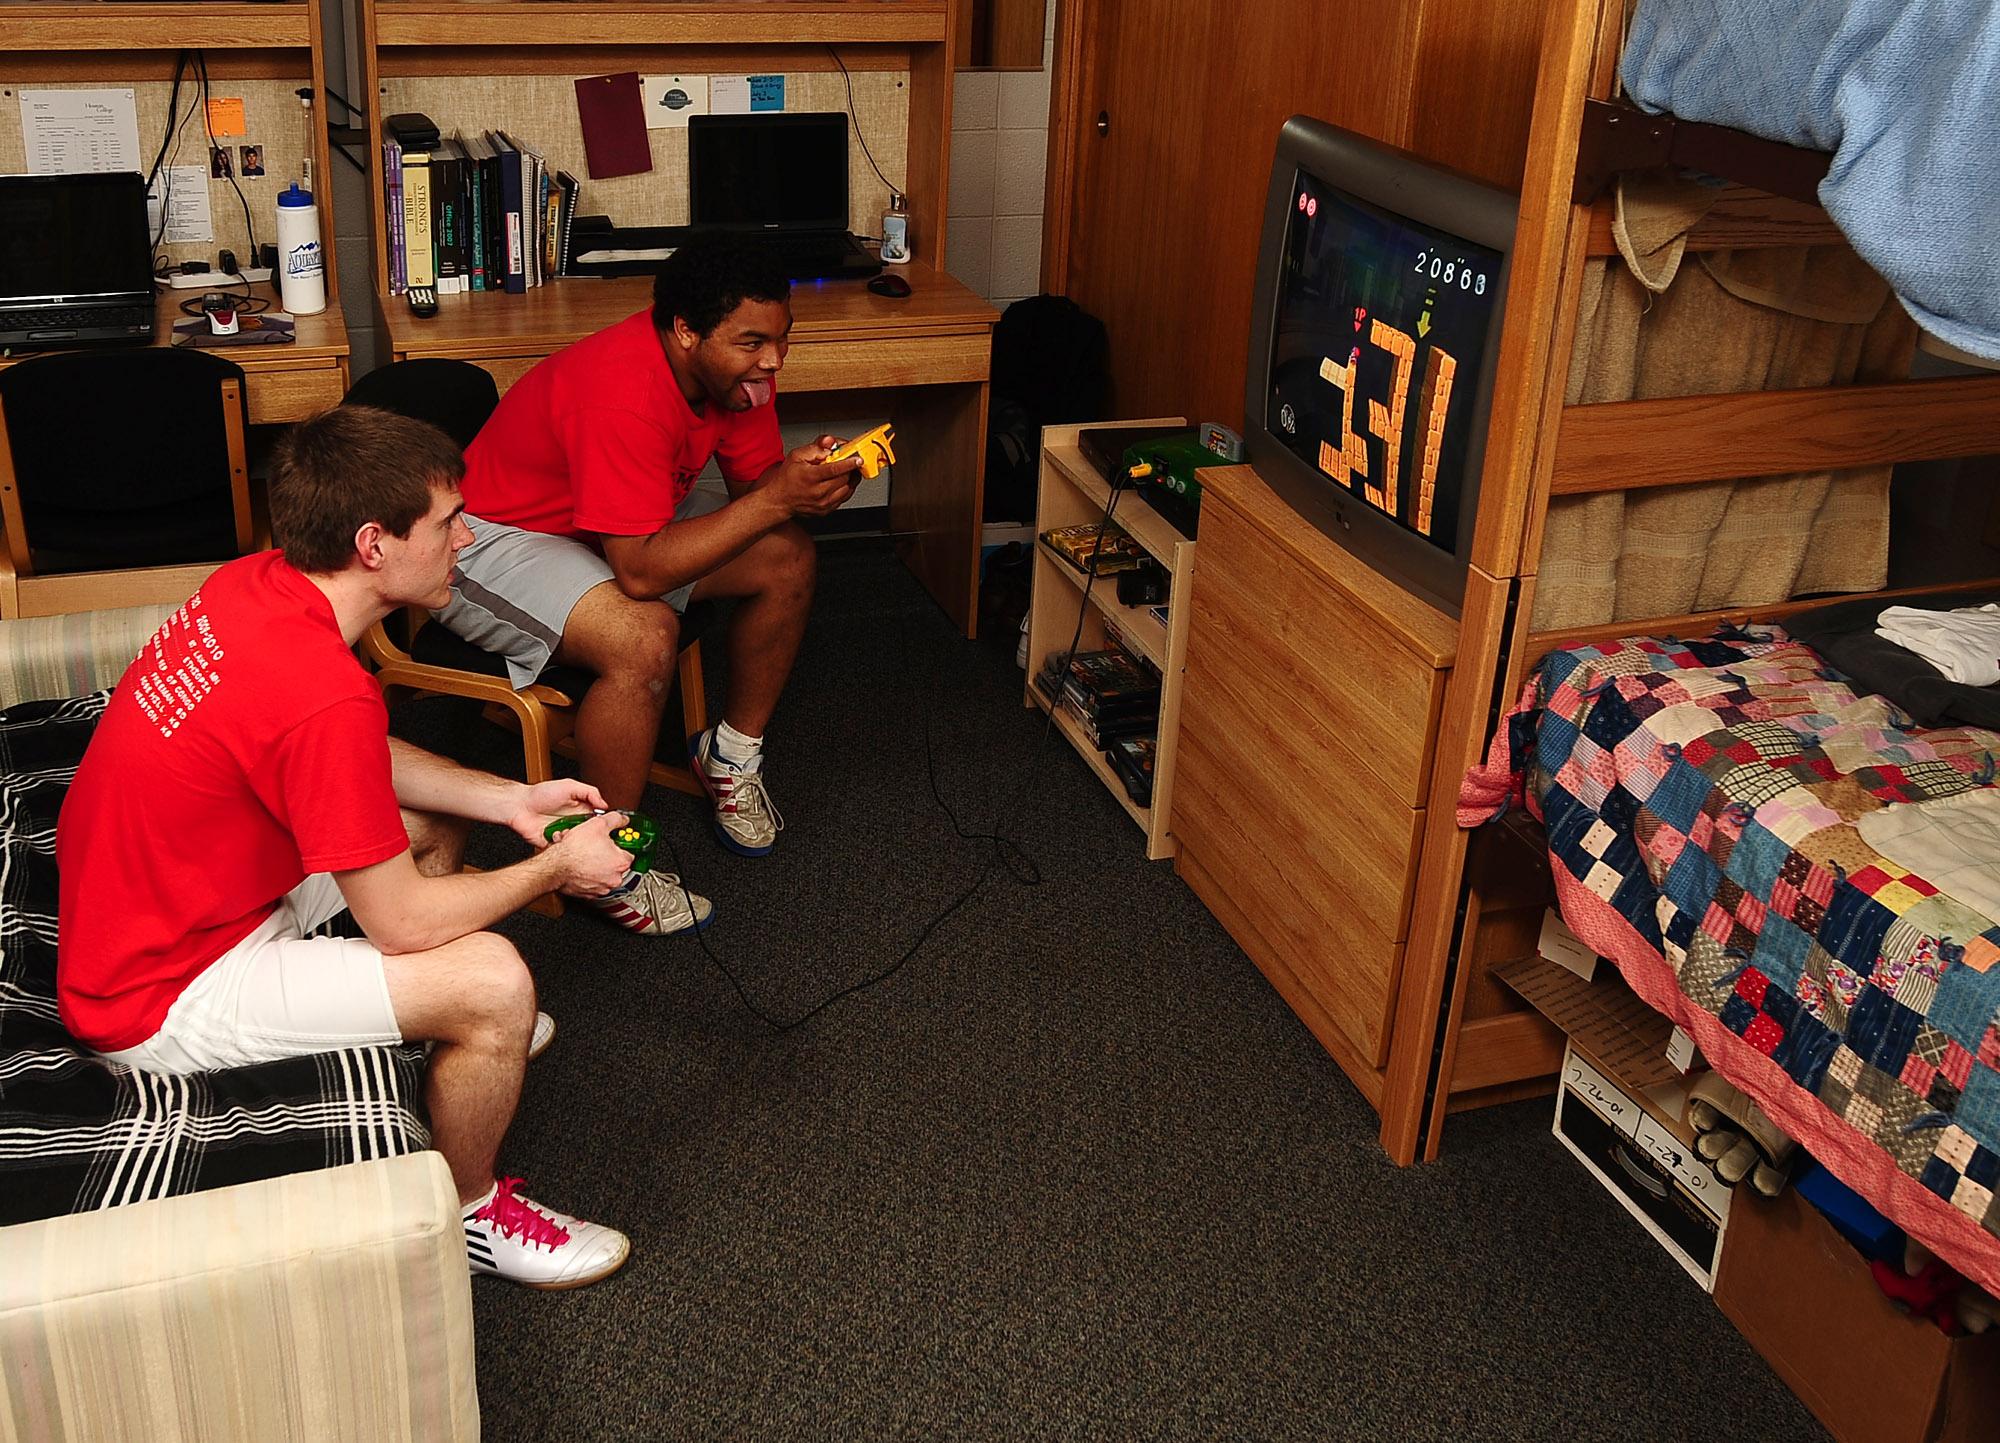 Kauffman Court Dorm Room Photo Part 72